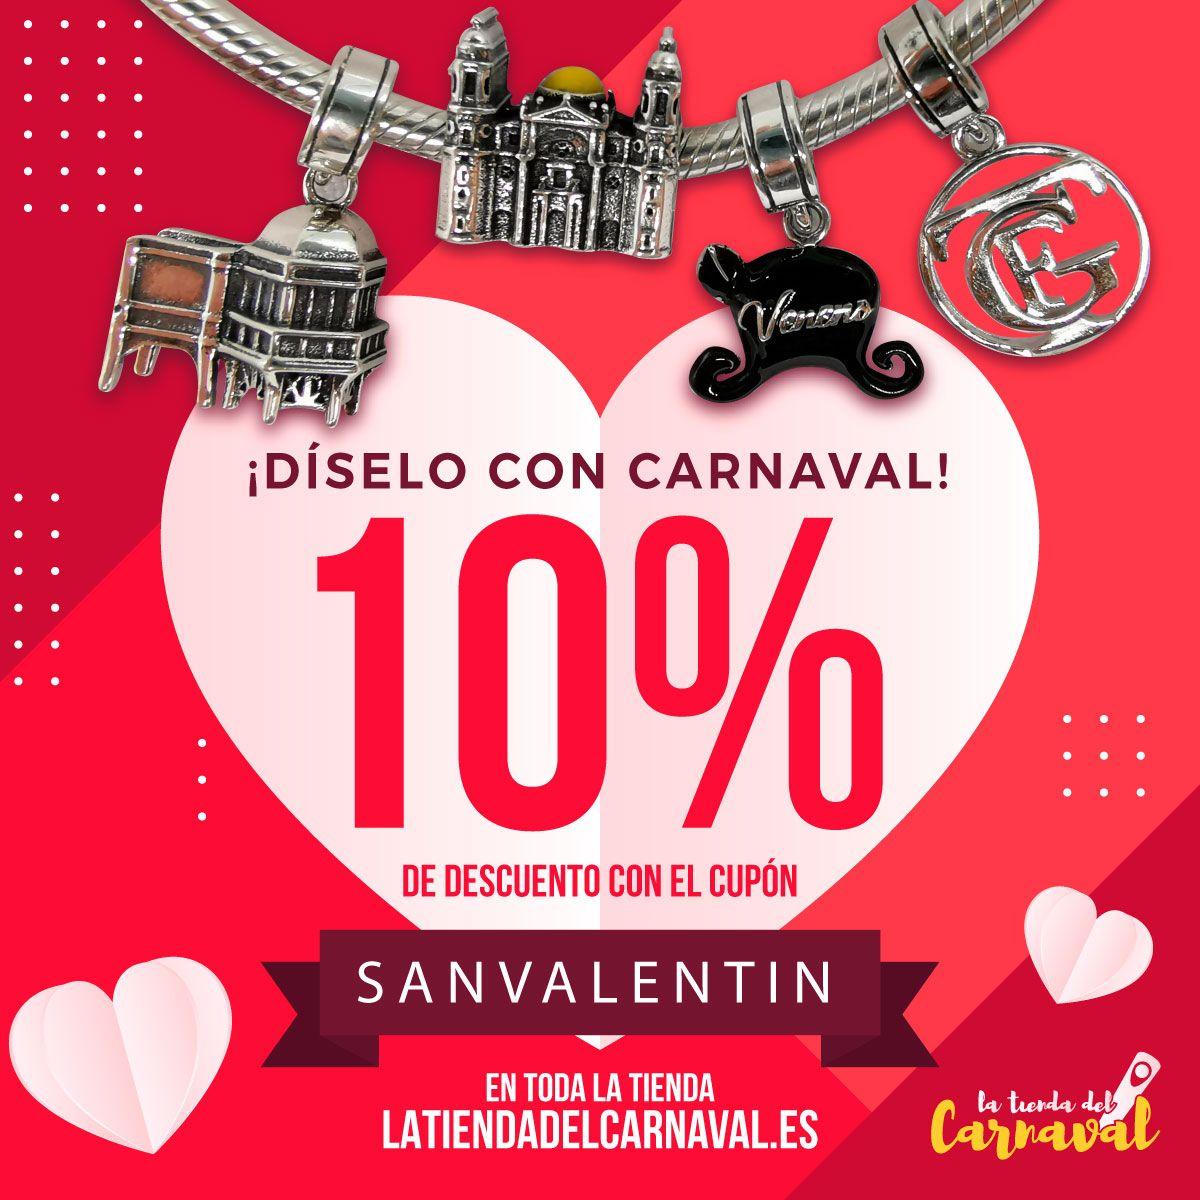 san valentin carnaval cadiz